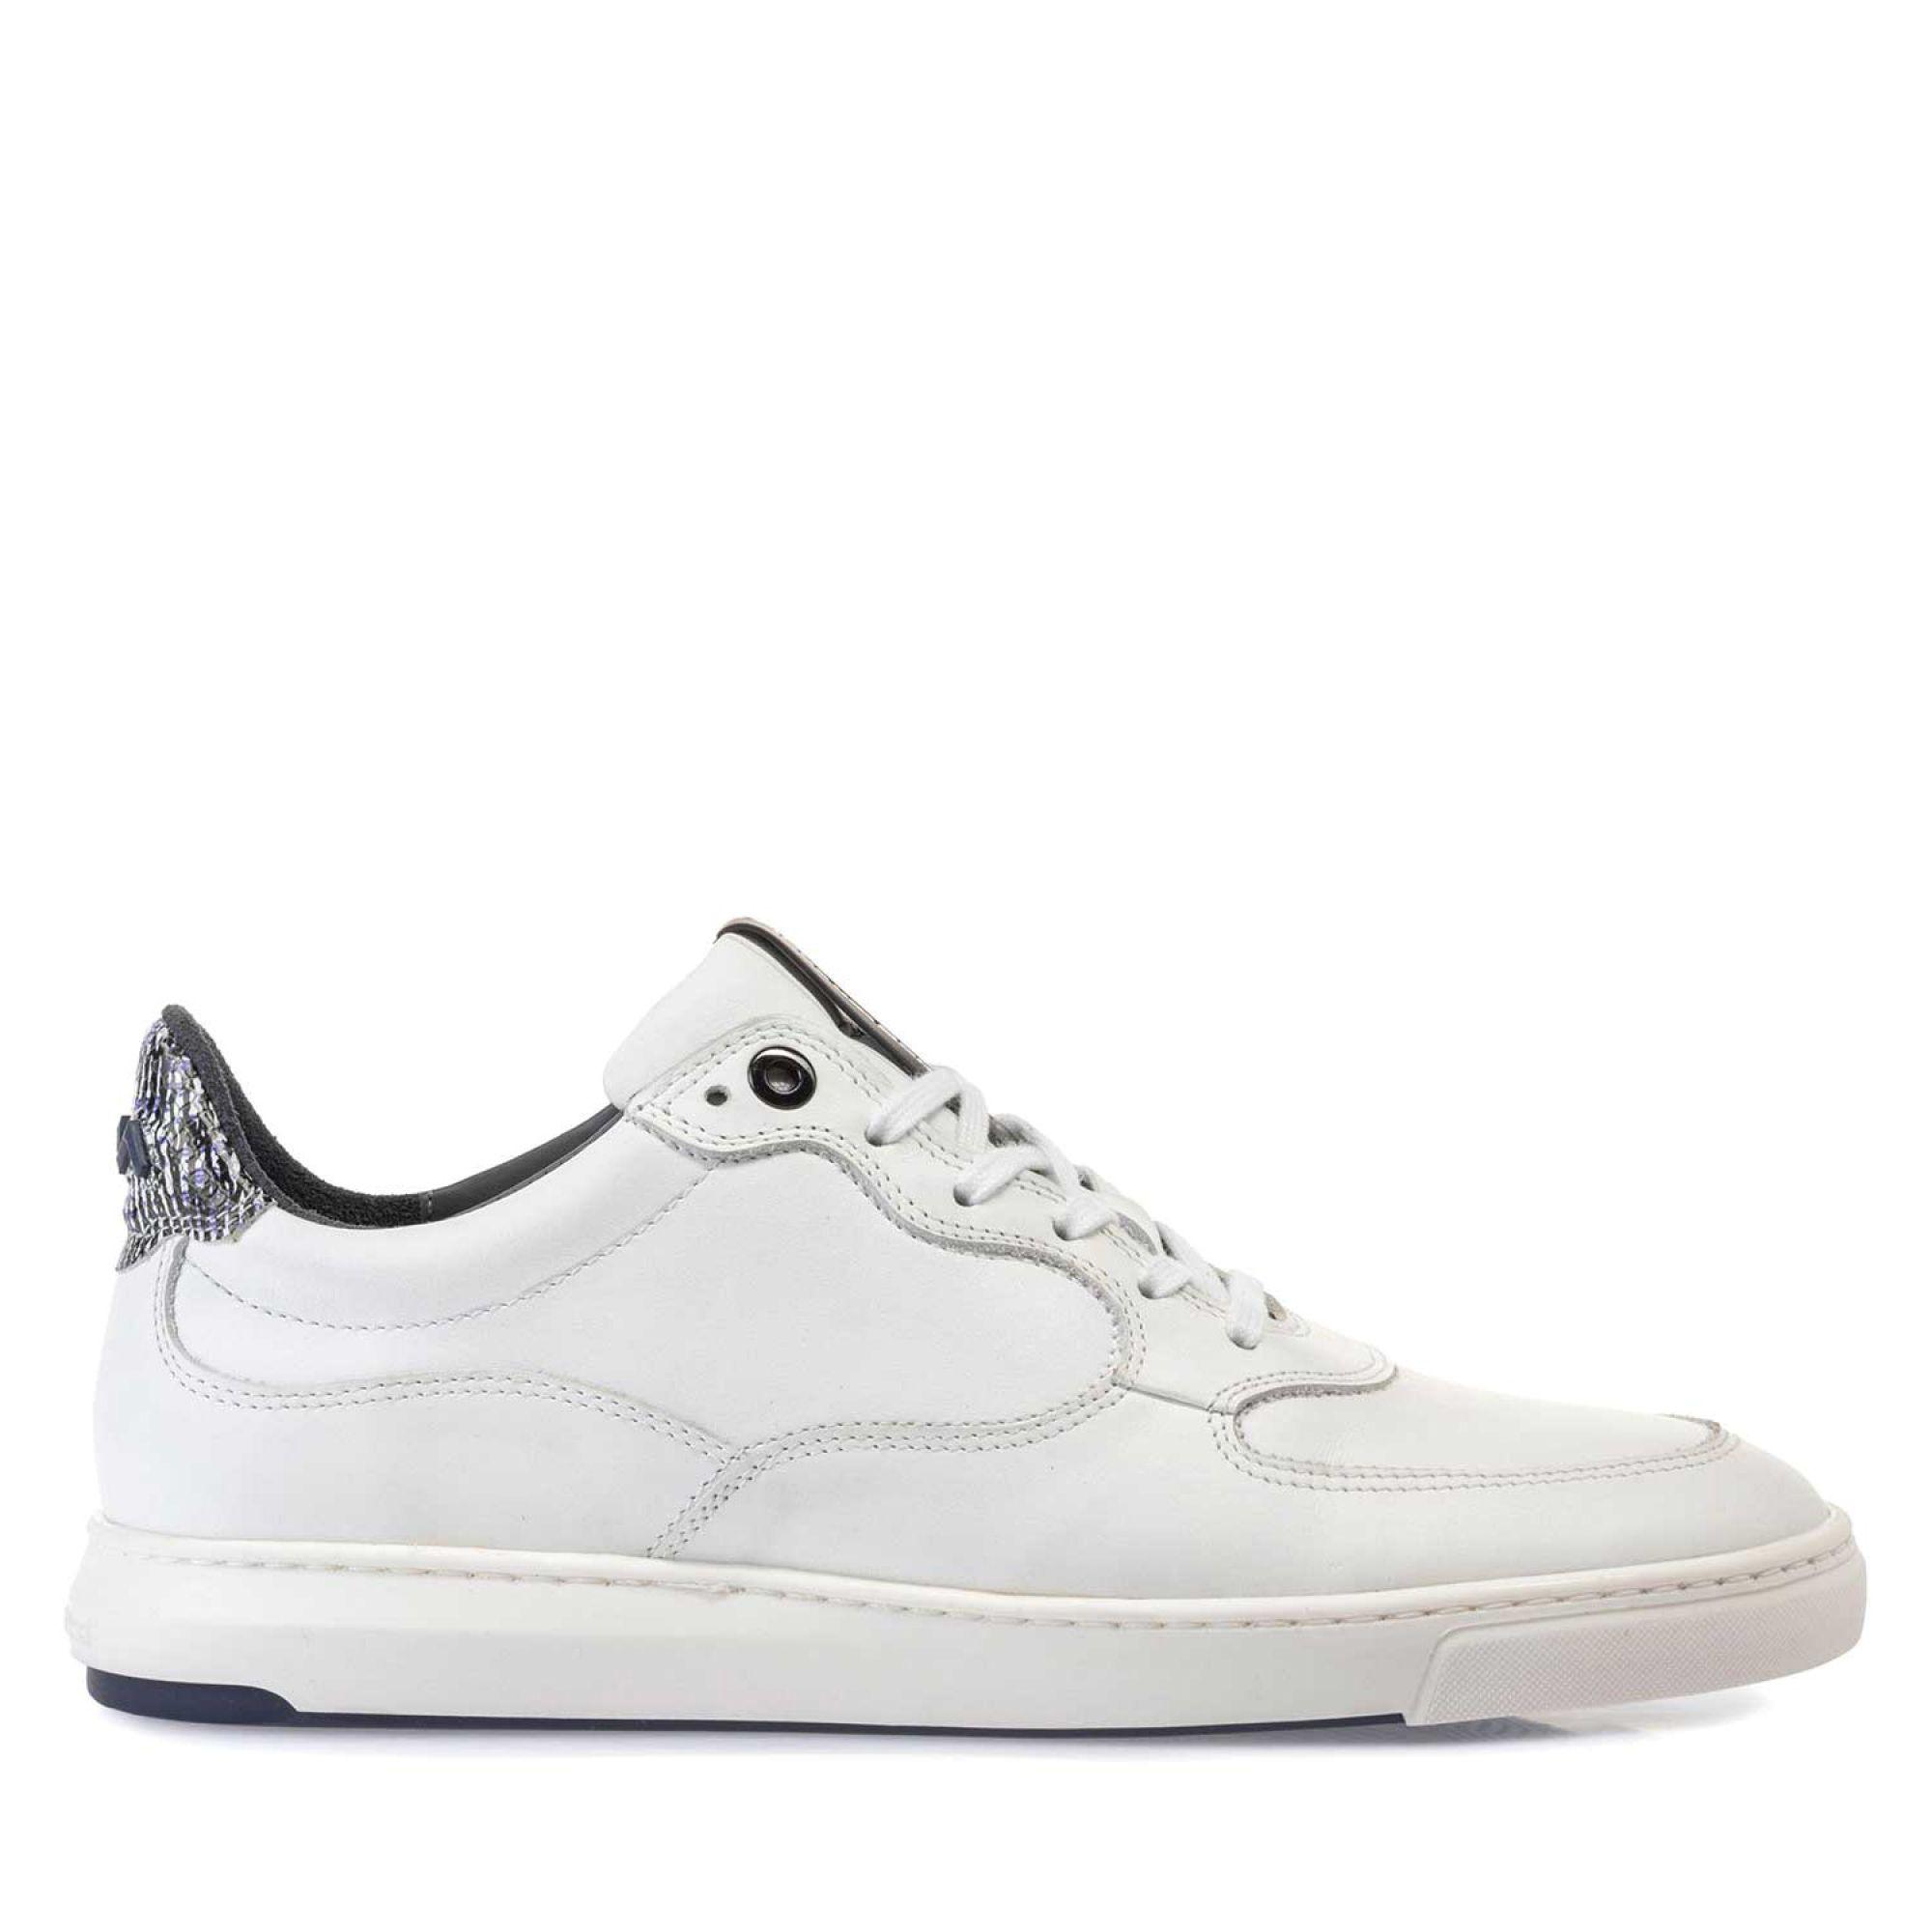 Floris van Bommel Heren SneakersSneakers